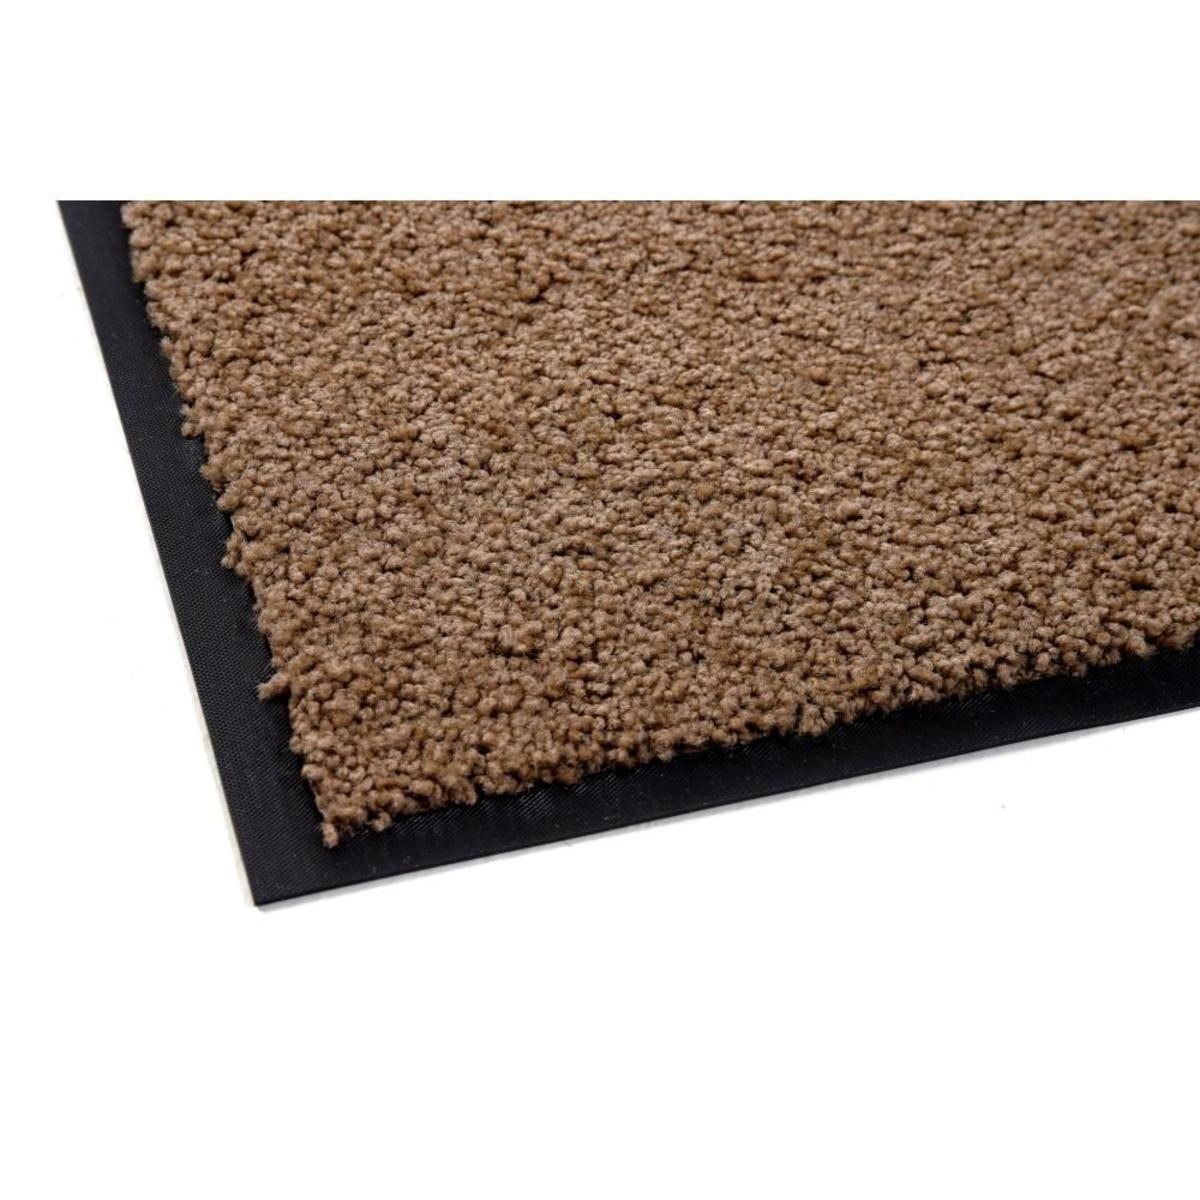 Bild 2 von acerto® EVODIA Premium Schmutzfangmatte Lavendel-Duft taupe - 90x150cm